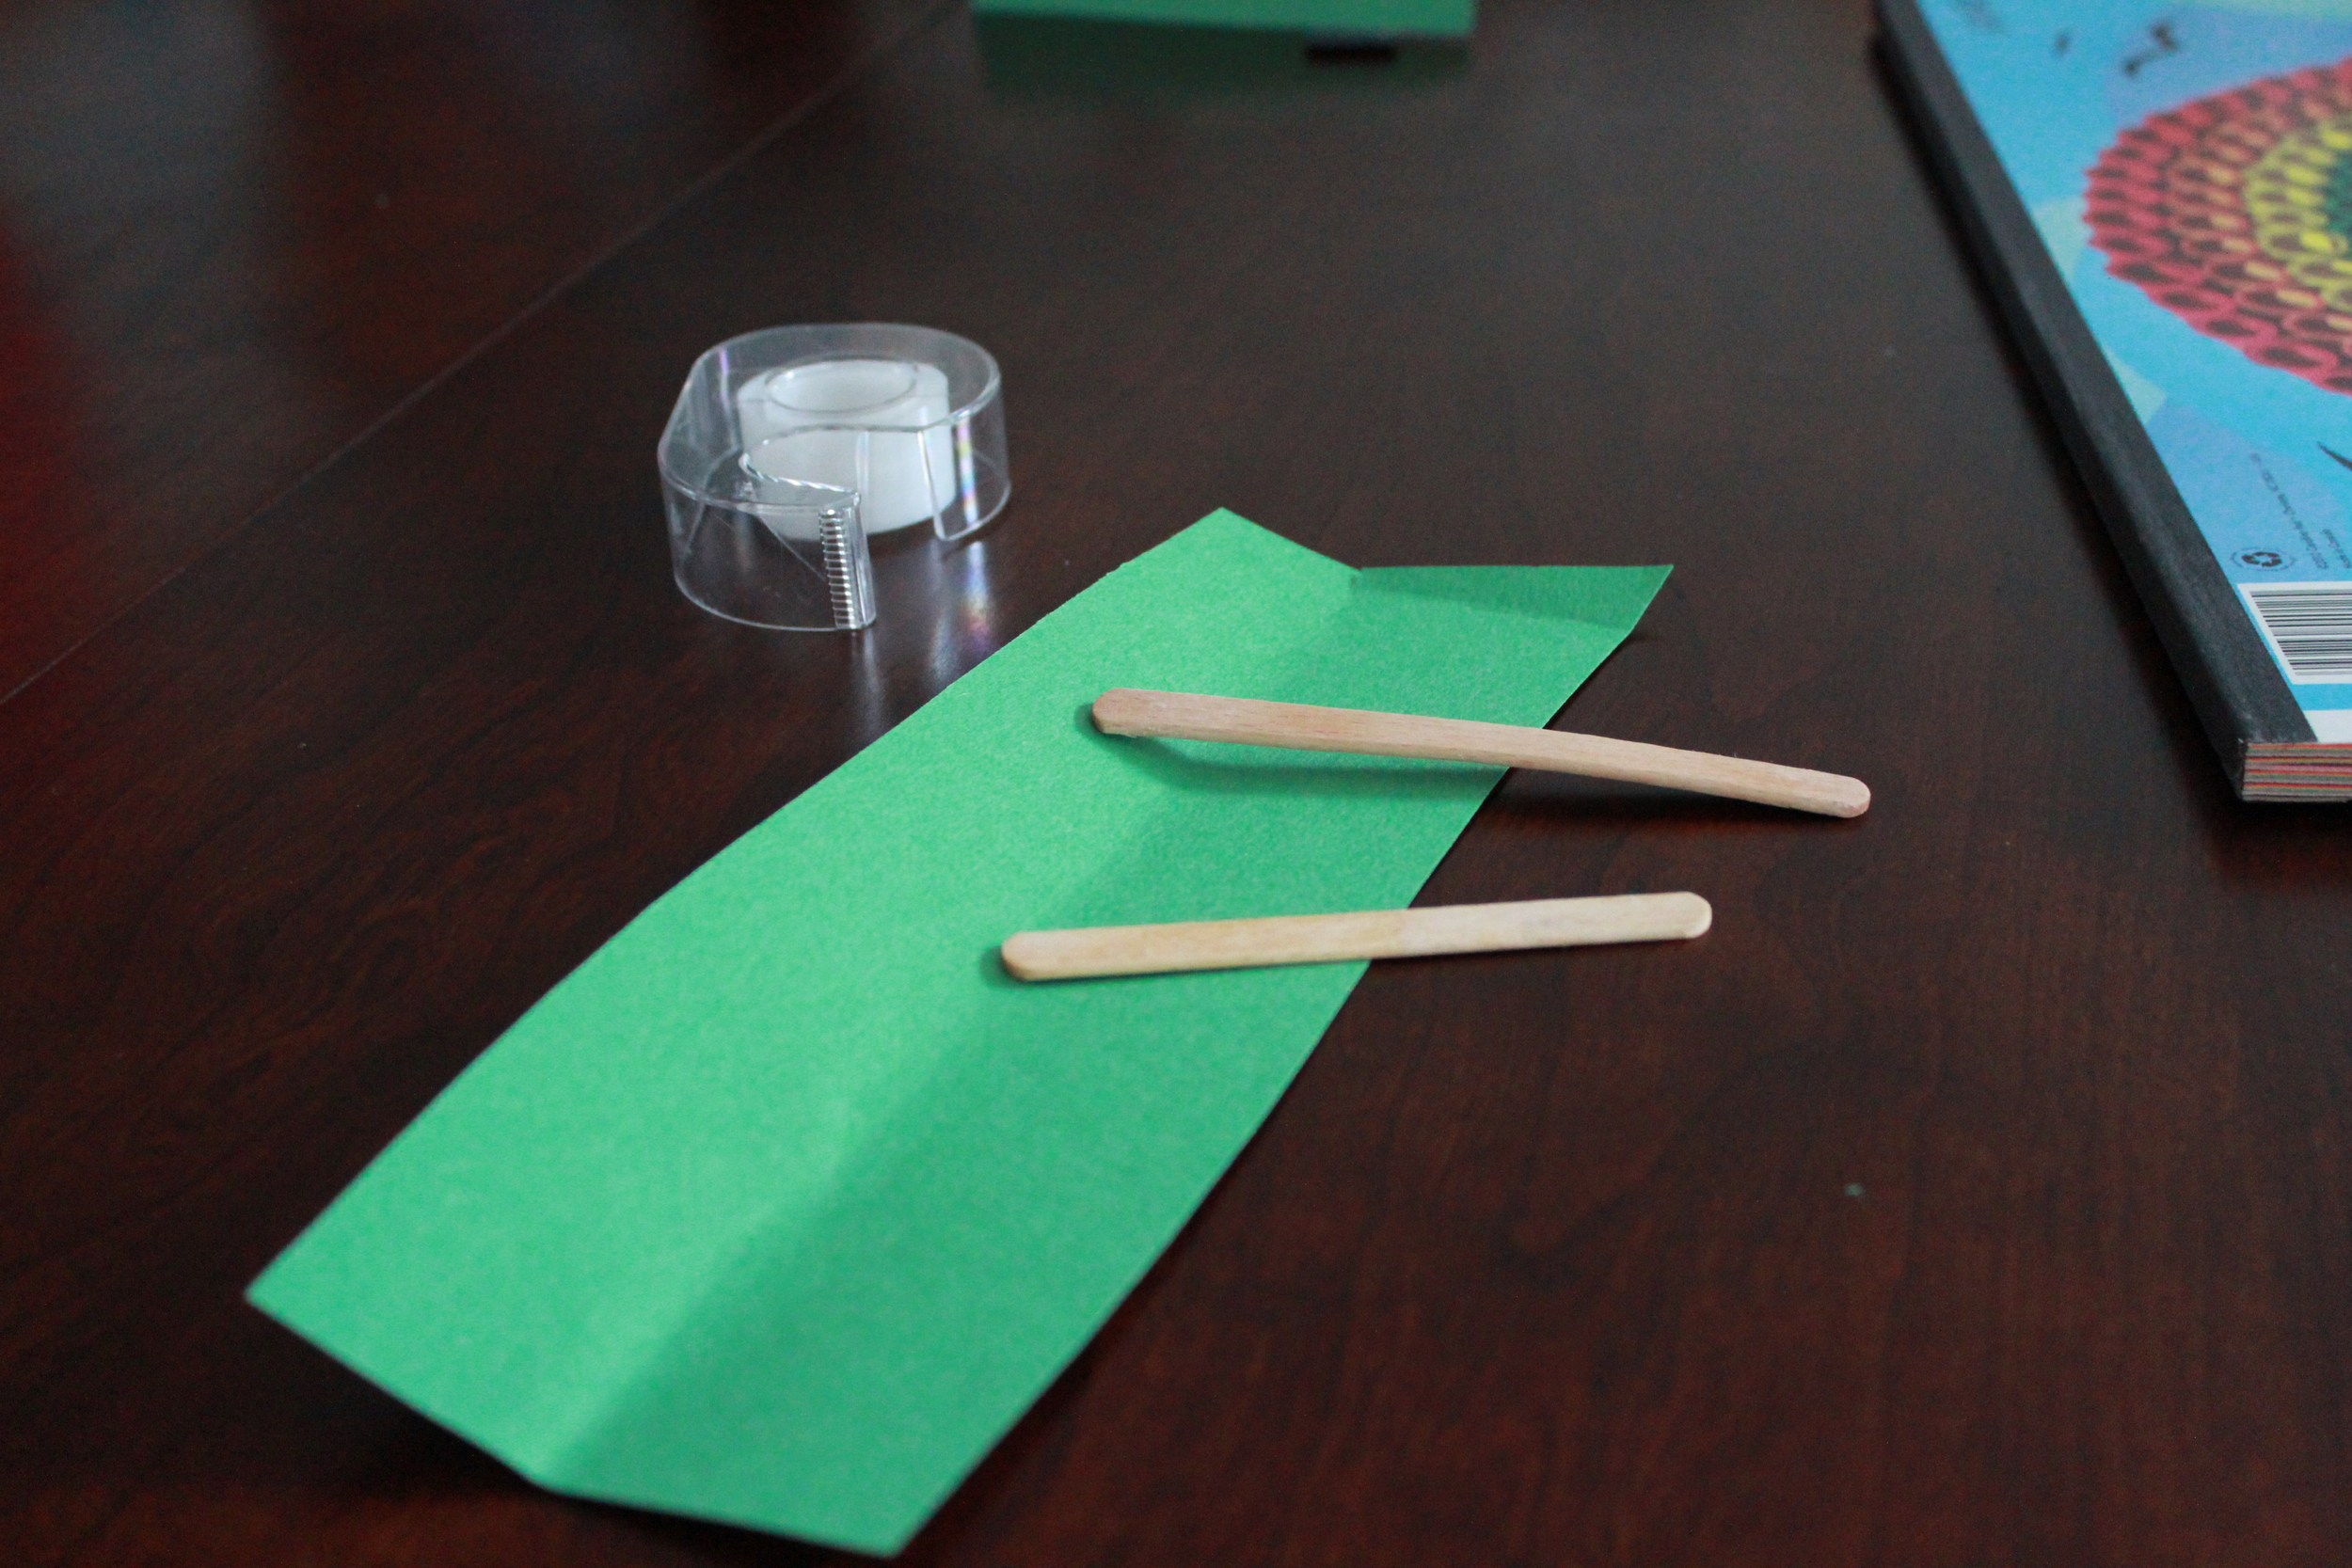 Supplies: Tape, popsicle sticks, construction paper.